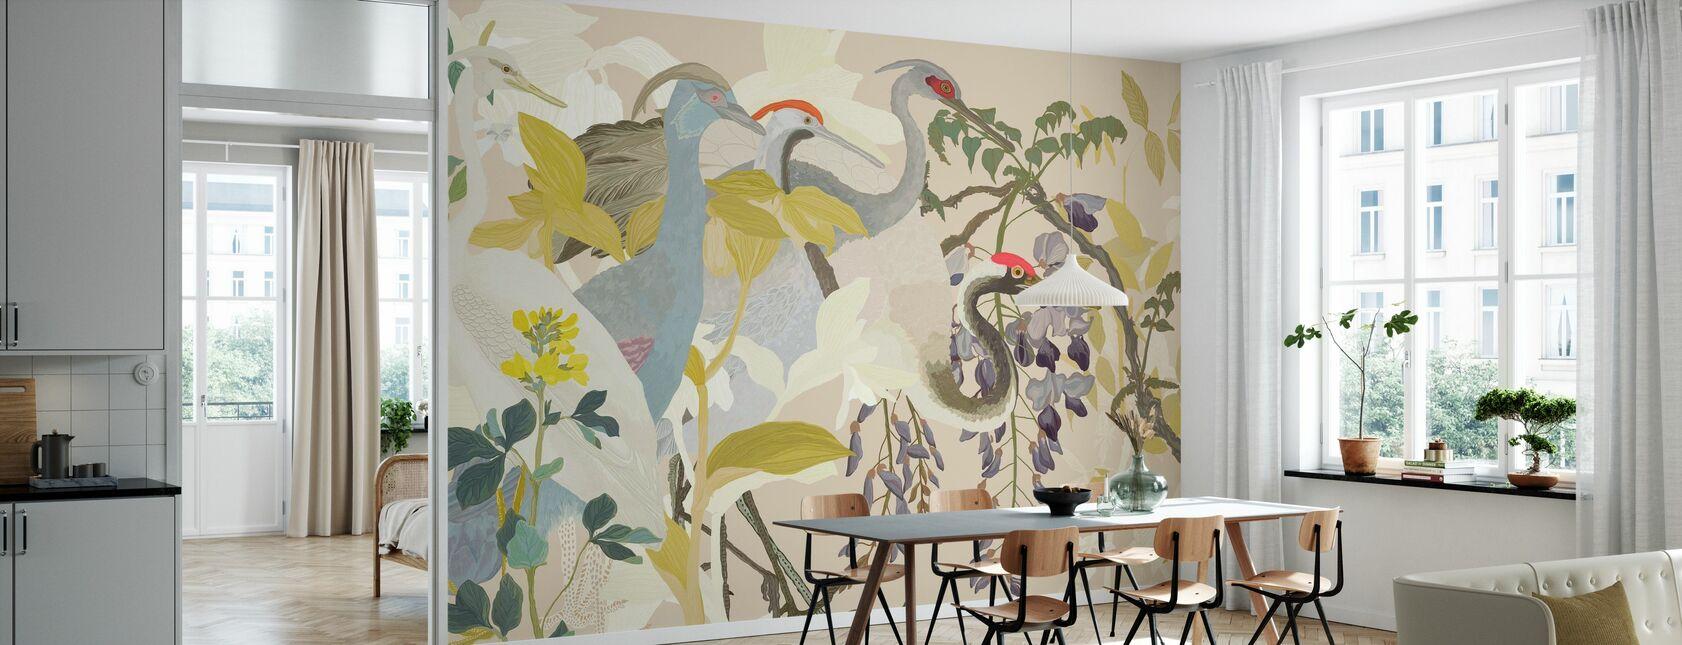 Curious Cranes II - Wallpaper - Kitchen